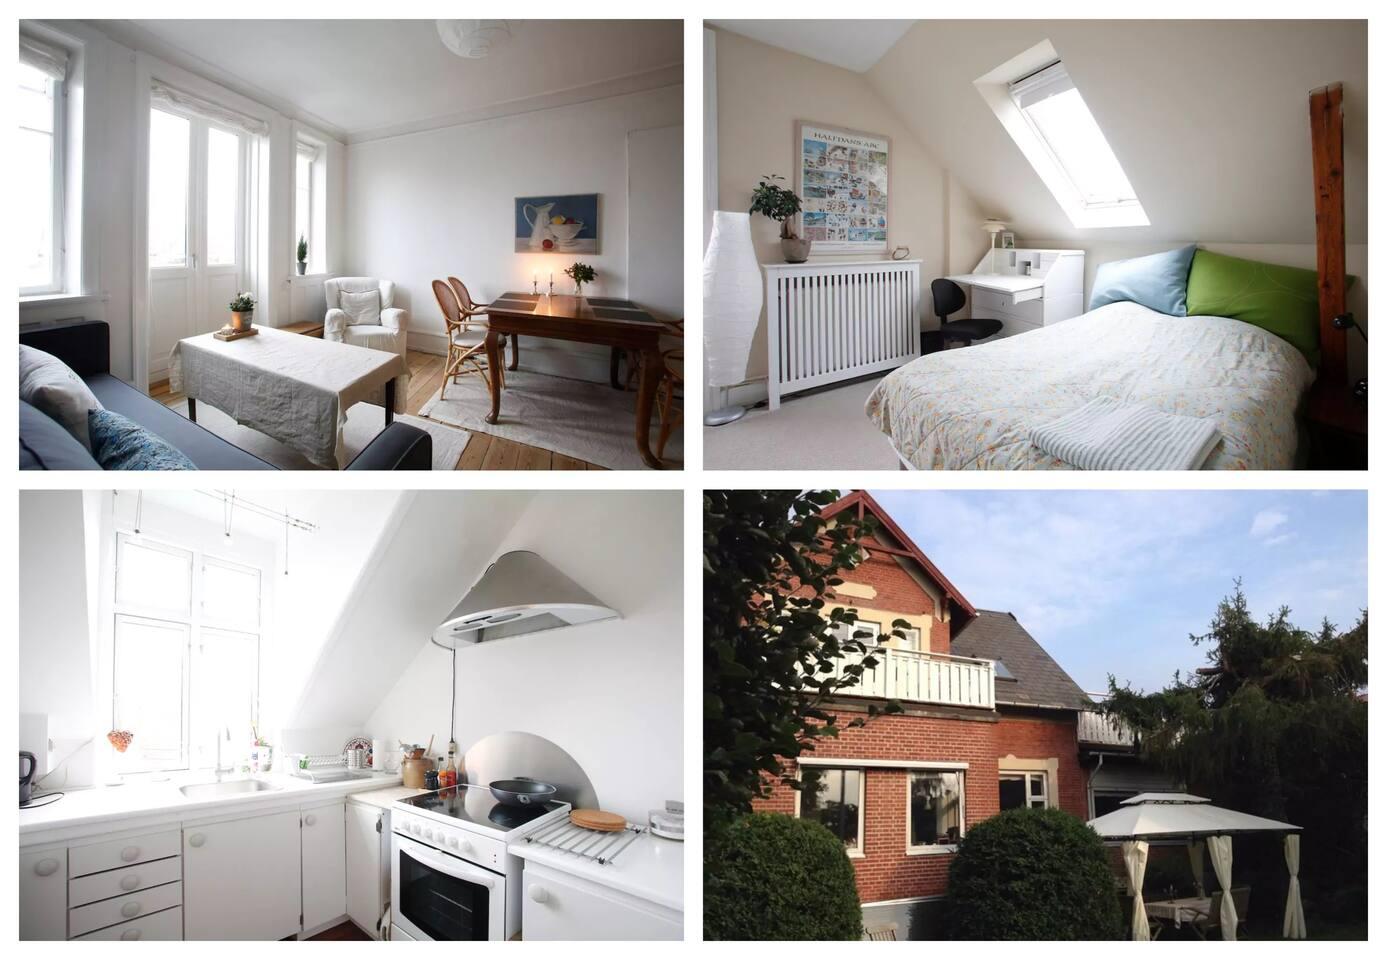 2 rooms w/ 2 terraces, own kitchen